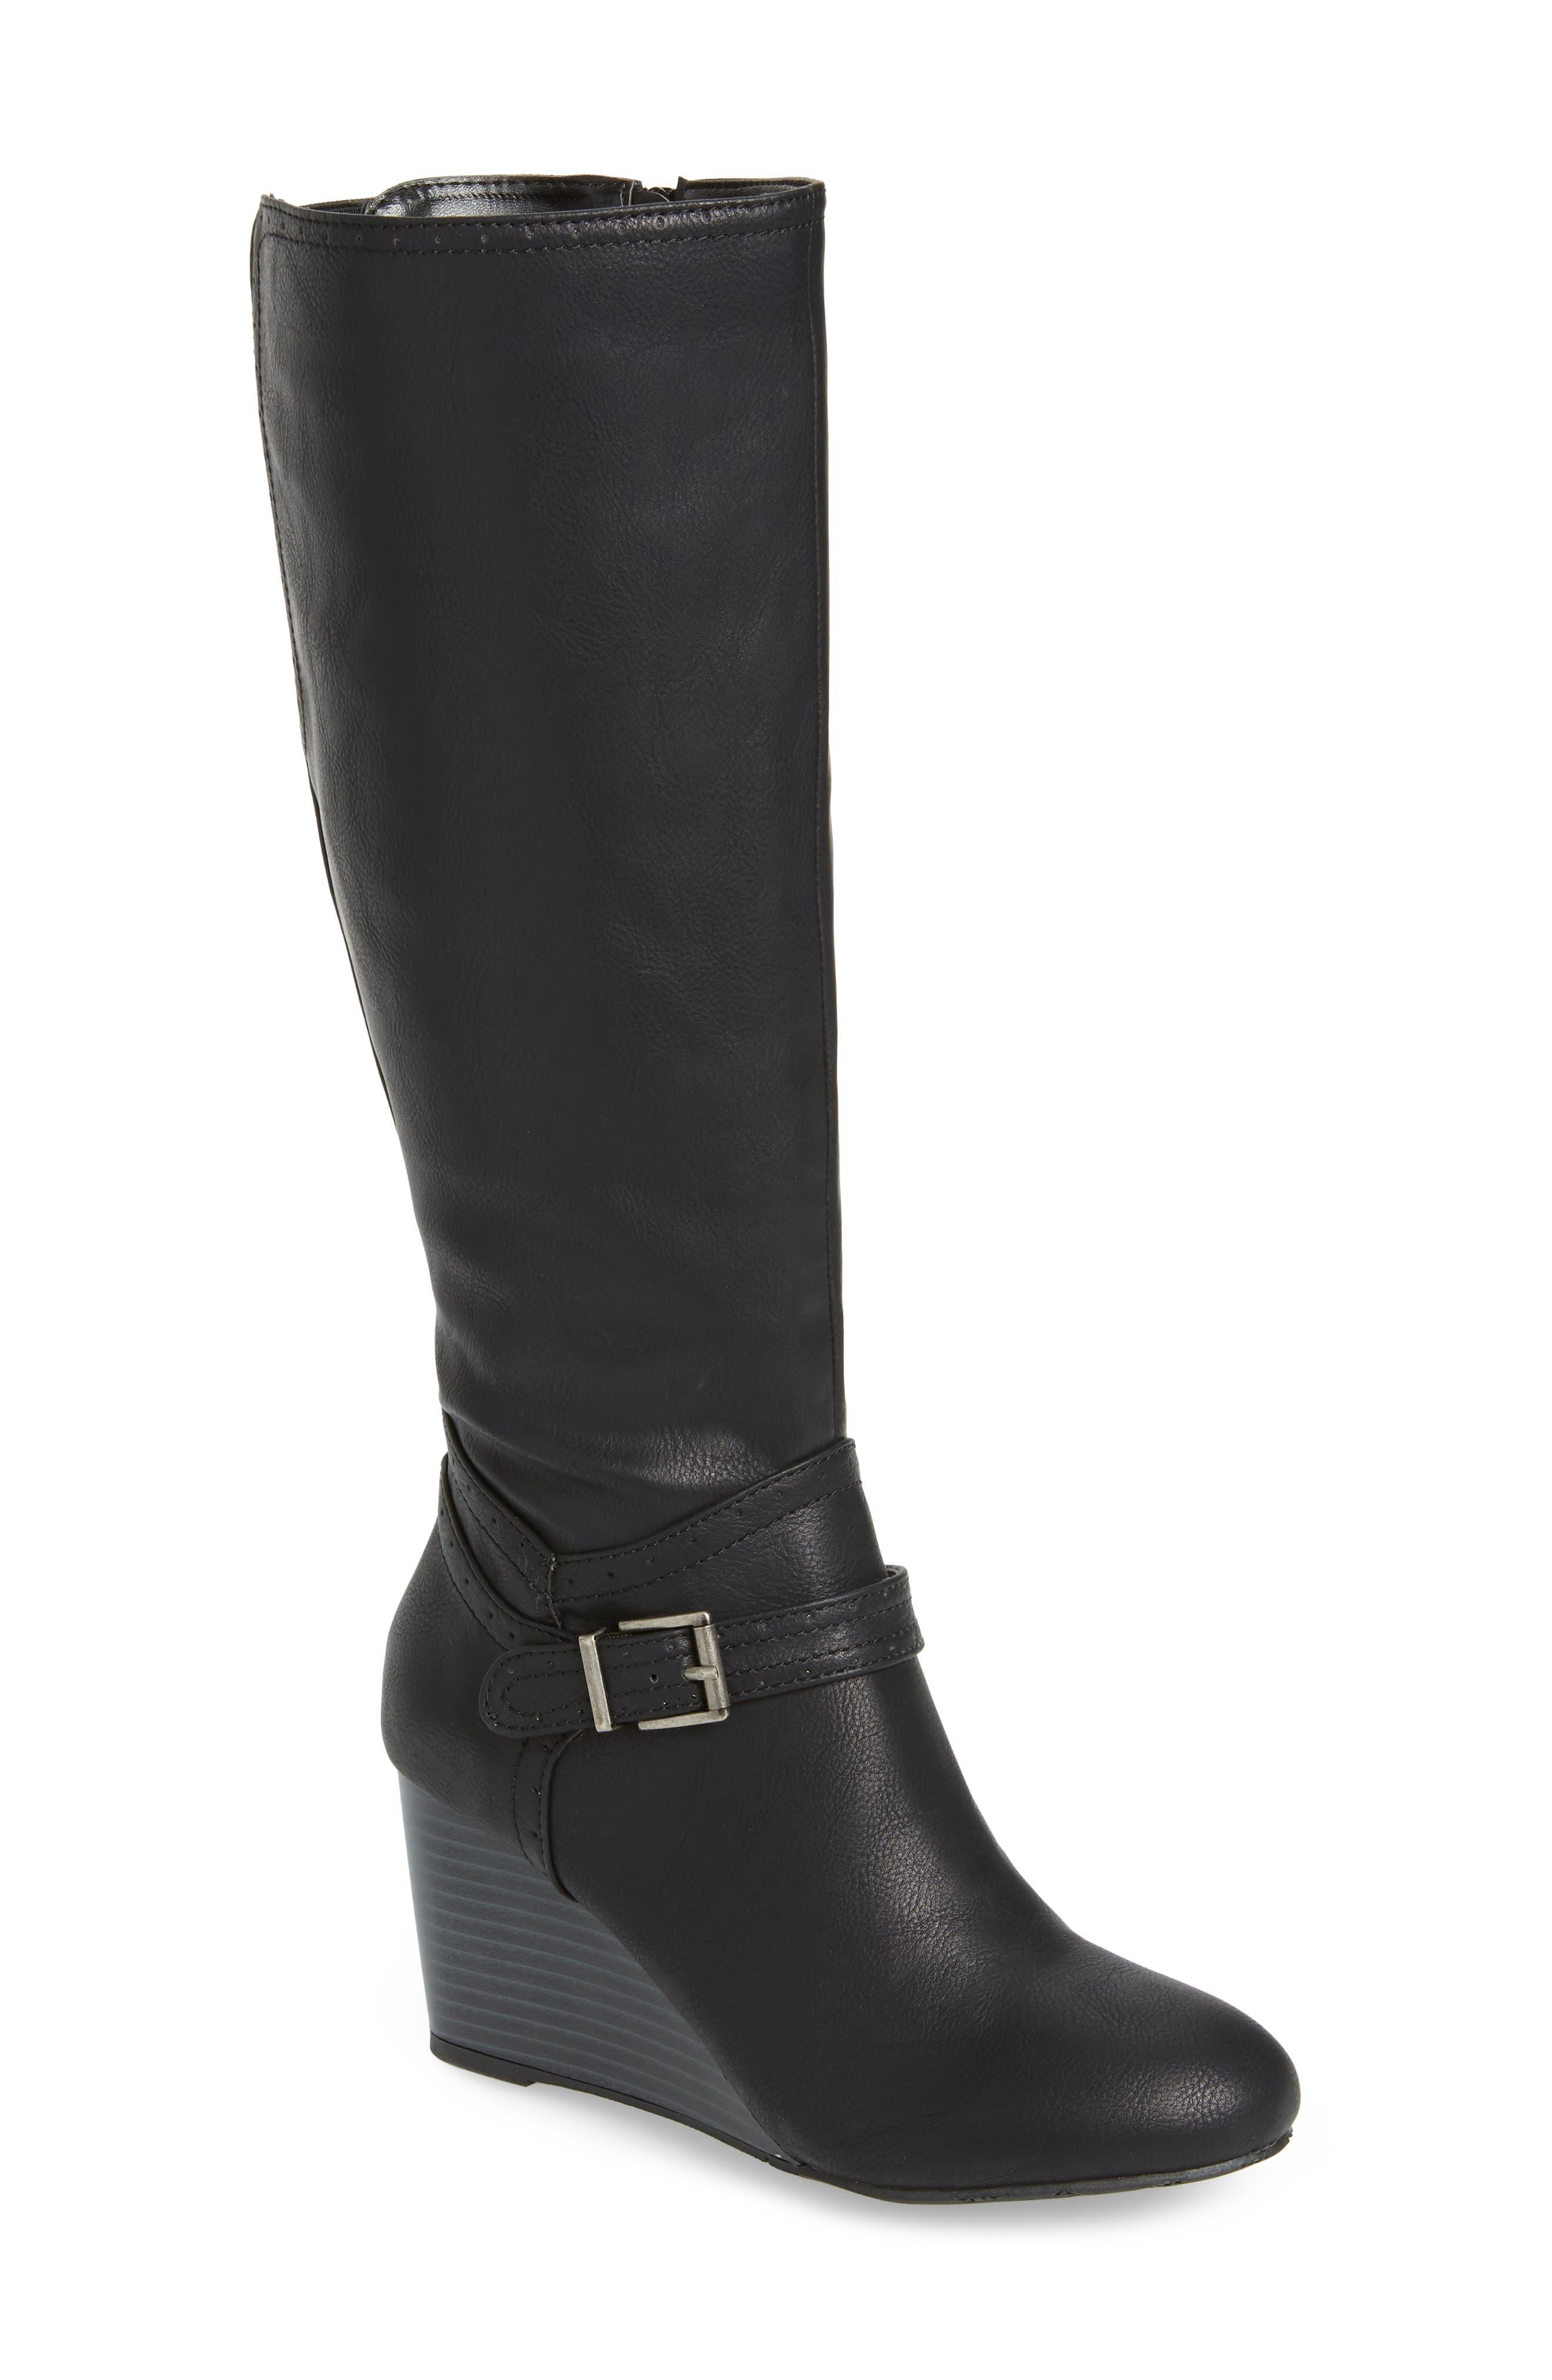 Claretta Knee High Wedge Boot,                         Main,                         color, BLACK VEGAN LEATHER